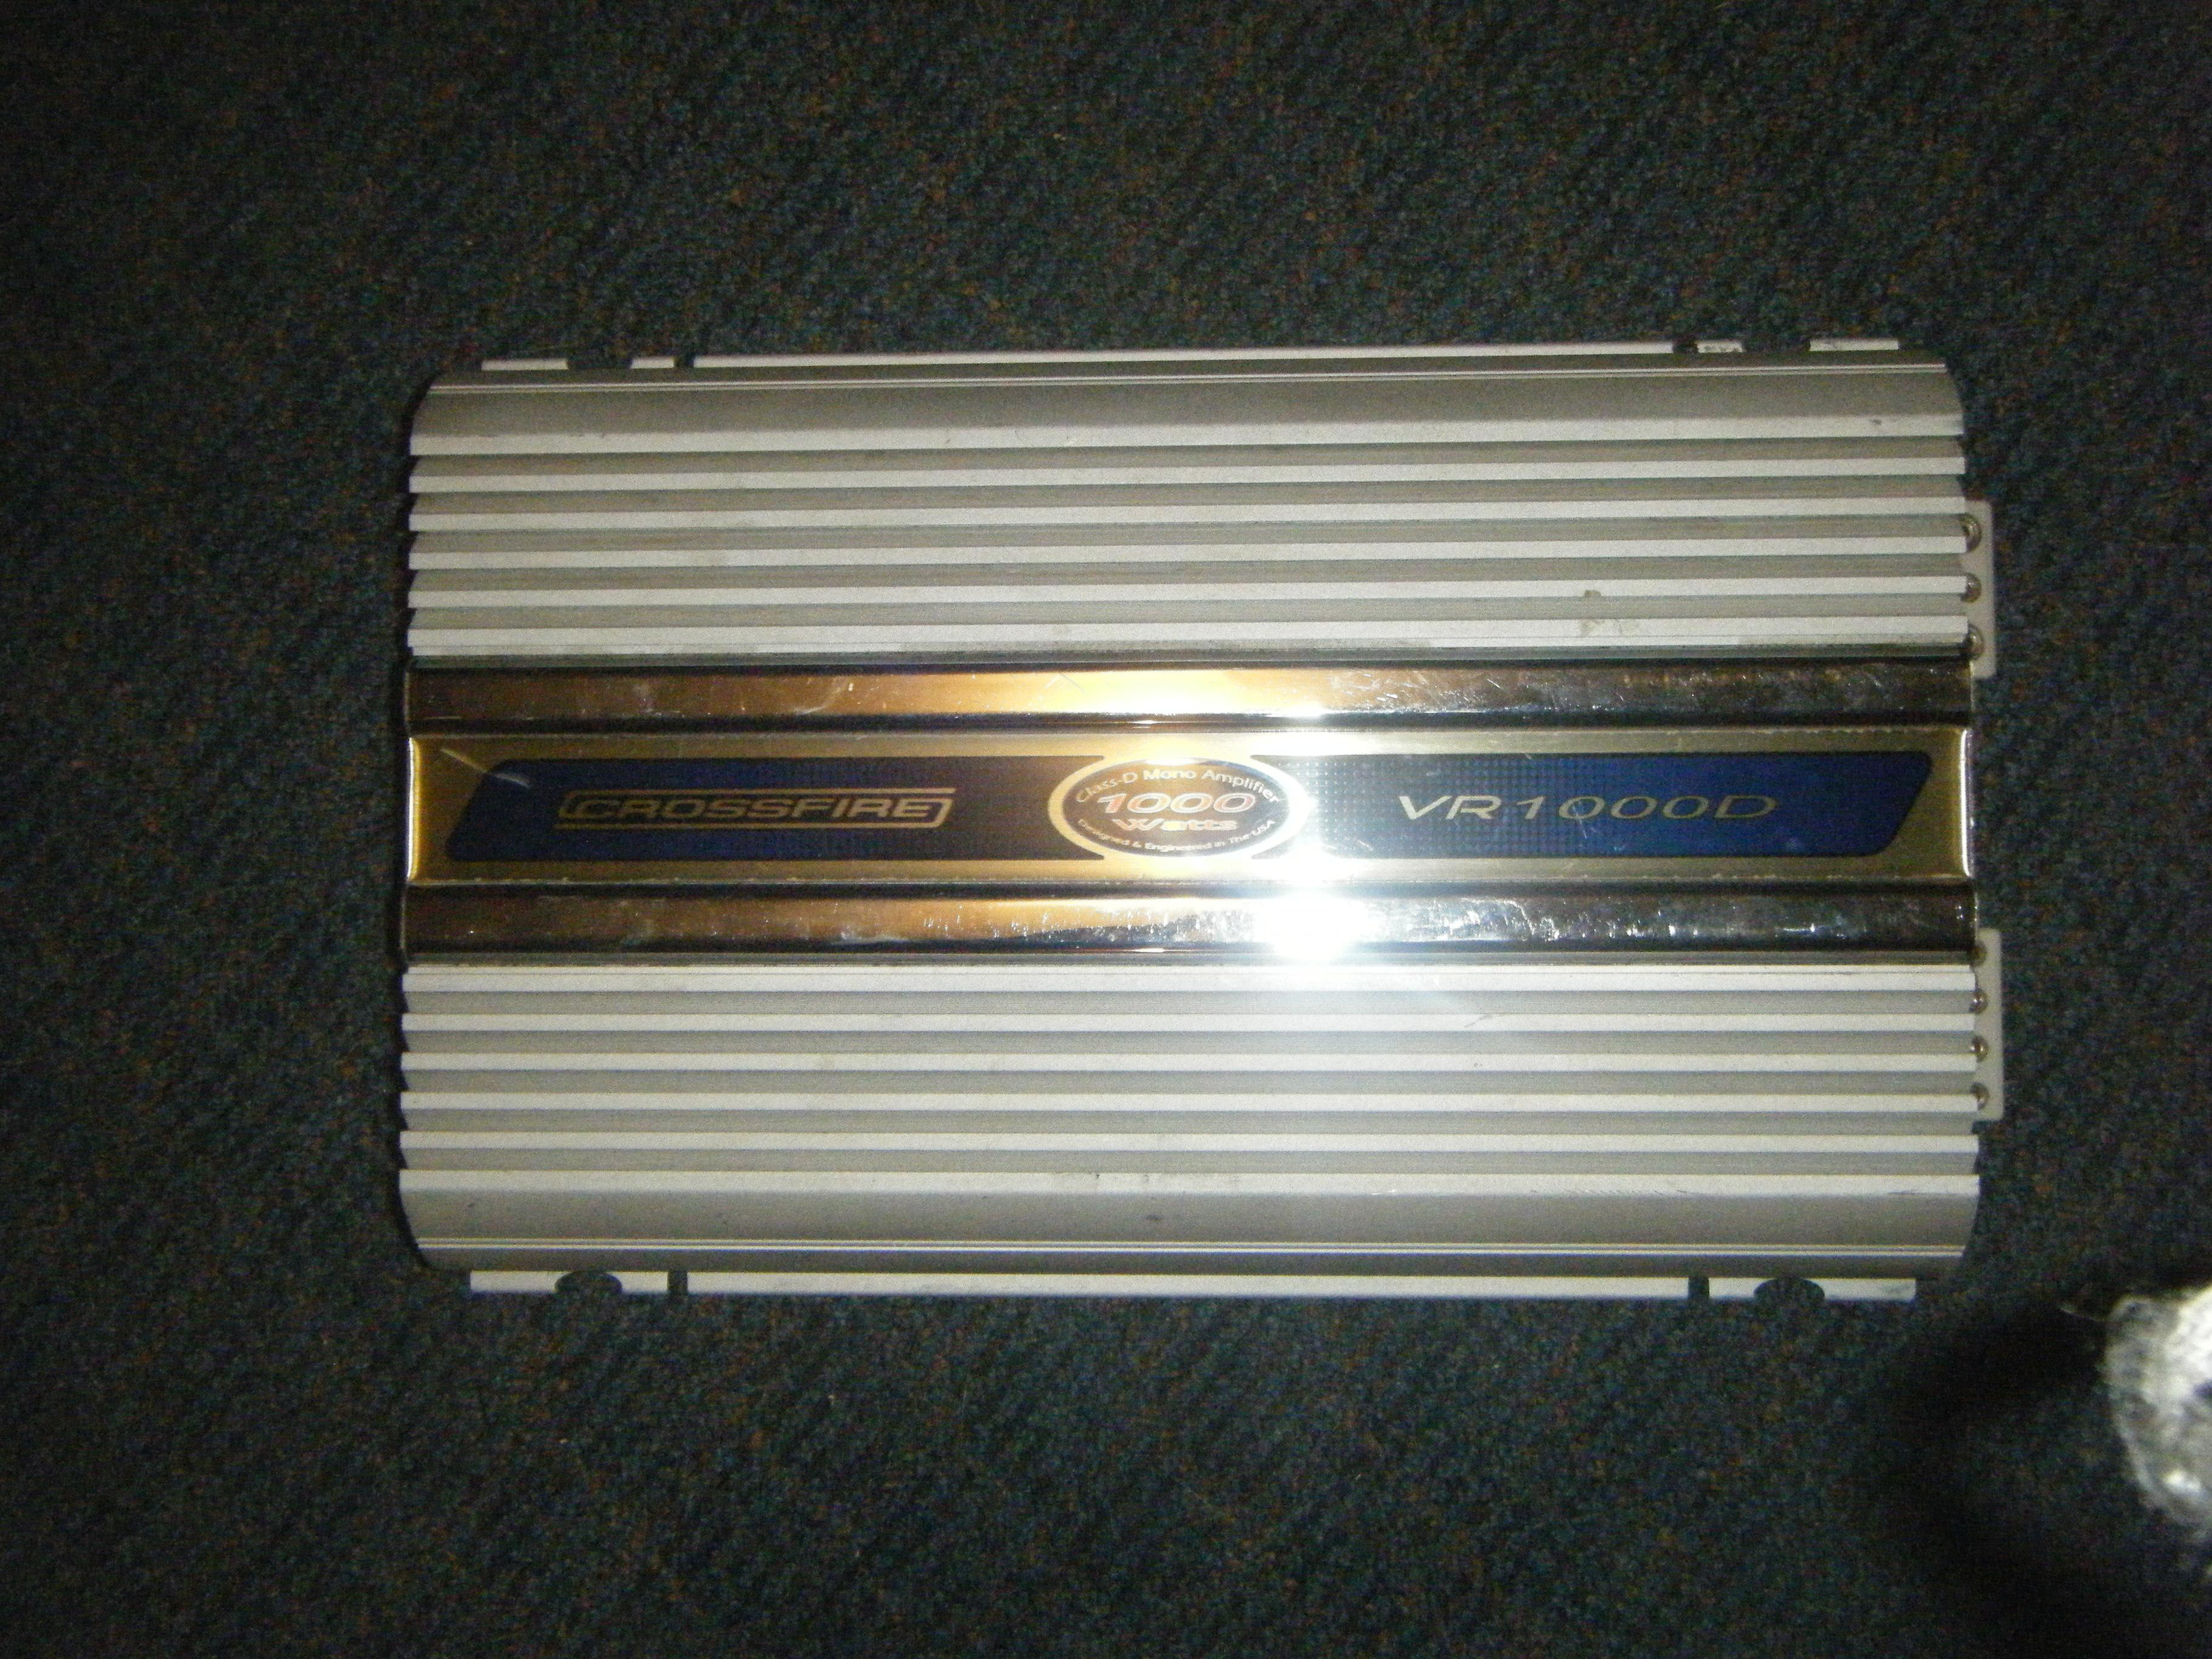 Siemens Car Player Wiring Diagram As Well 163709698 Besides 44694195